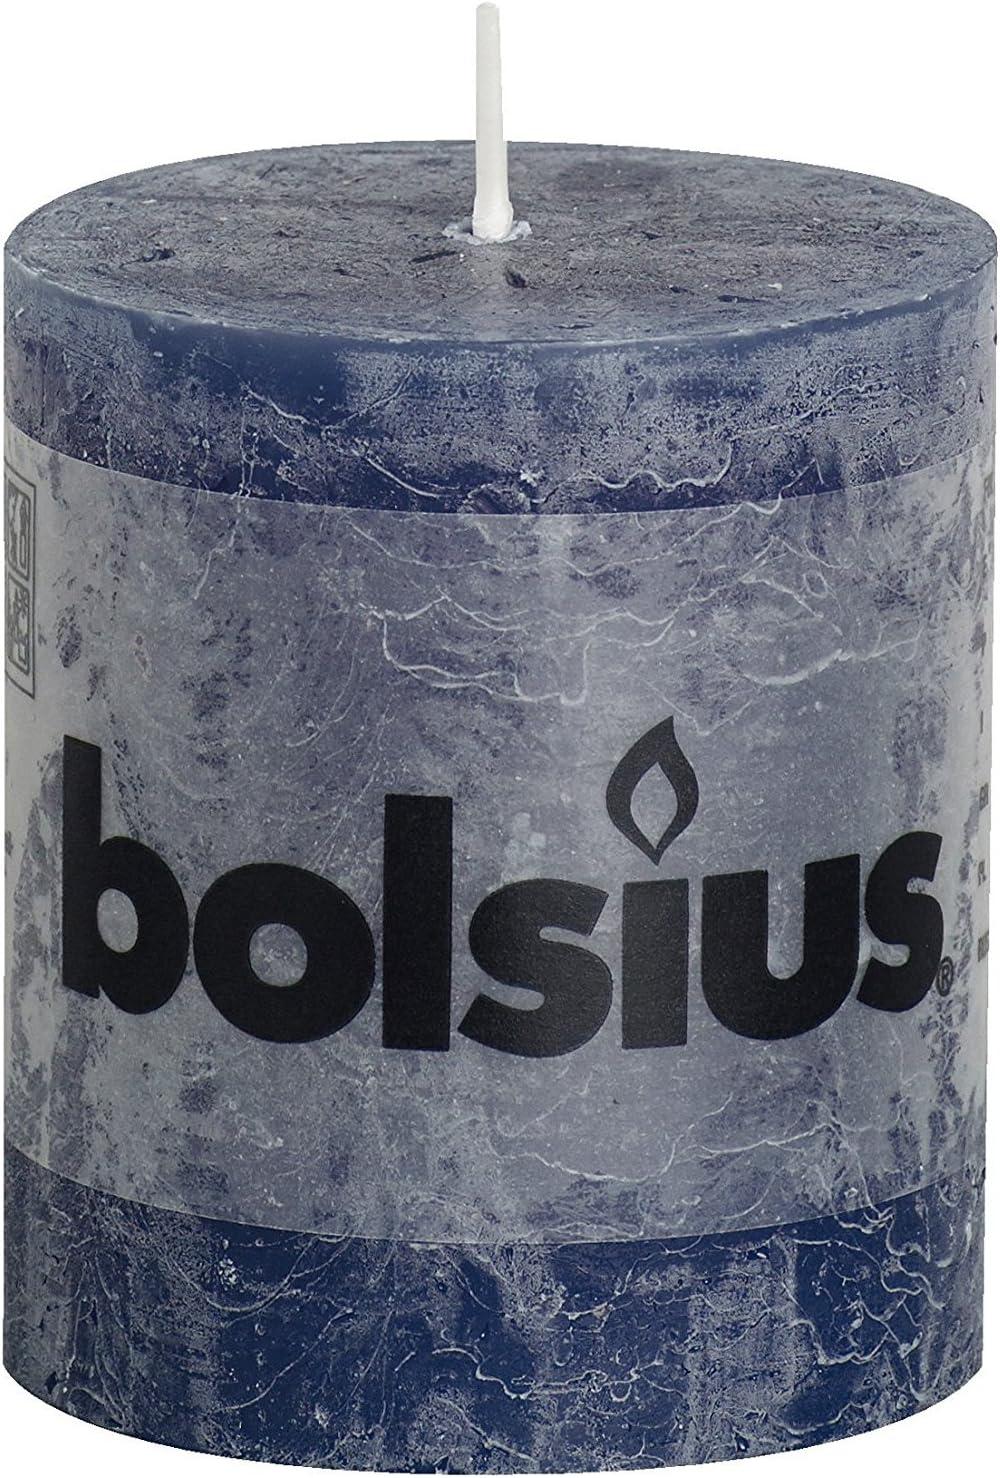 dunkelblau 6 St/ück bolsius 103867590365 Rustik Stumpenkerze 13 x 7 cm